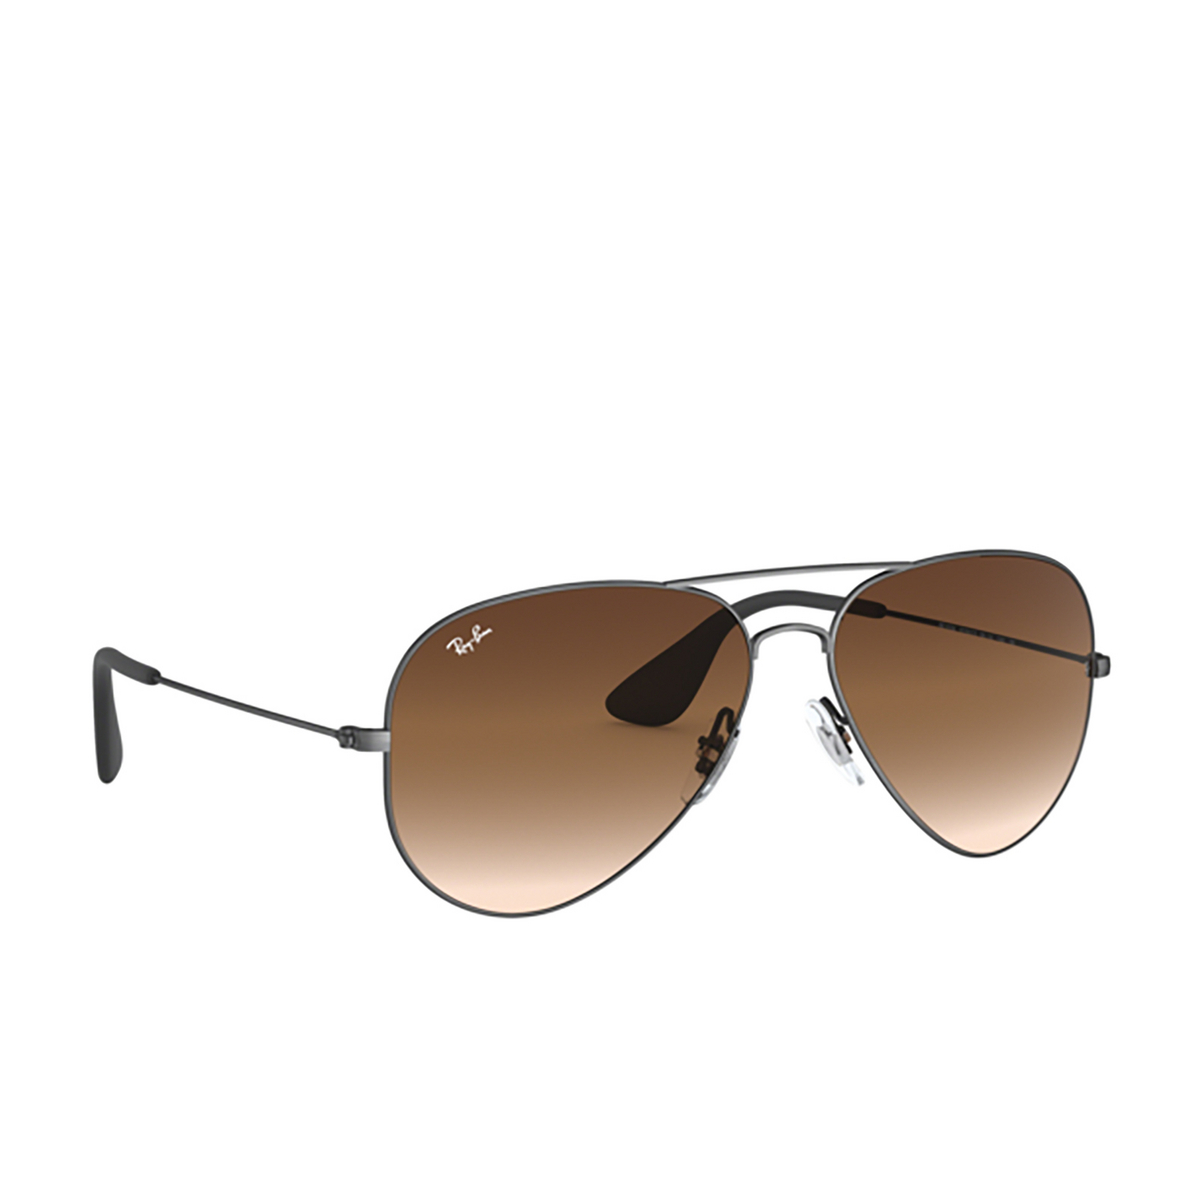 Ray-Ban® Aviator Sunglasses: RB3558 color Matte Black Antique 913913 - 2/3.